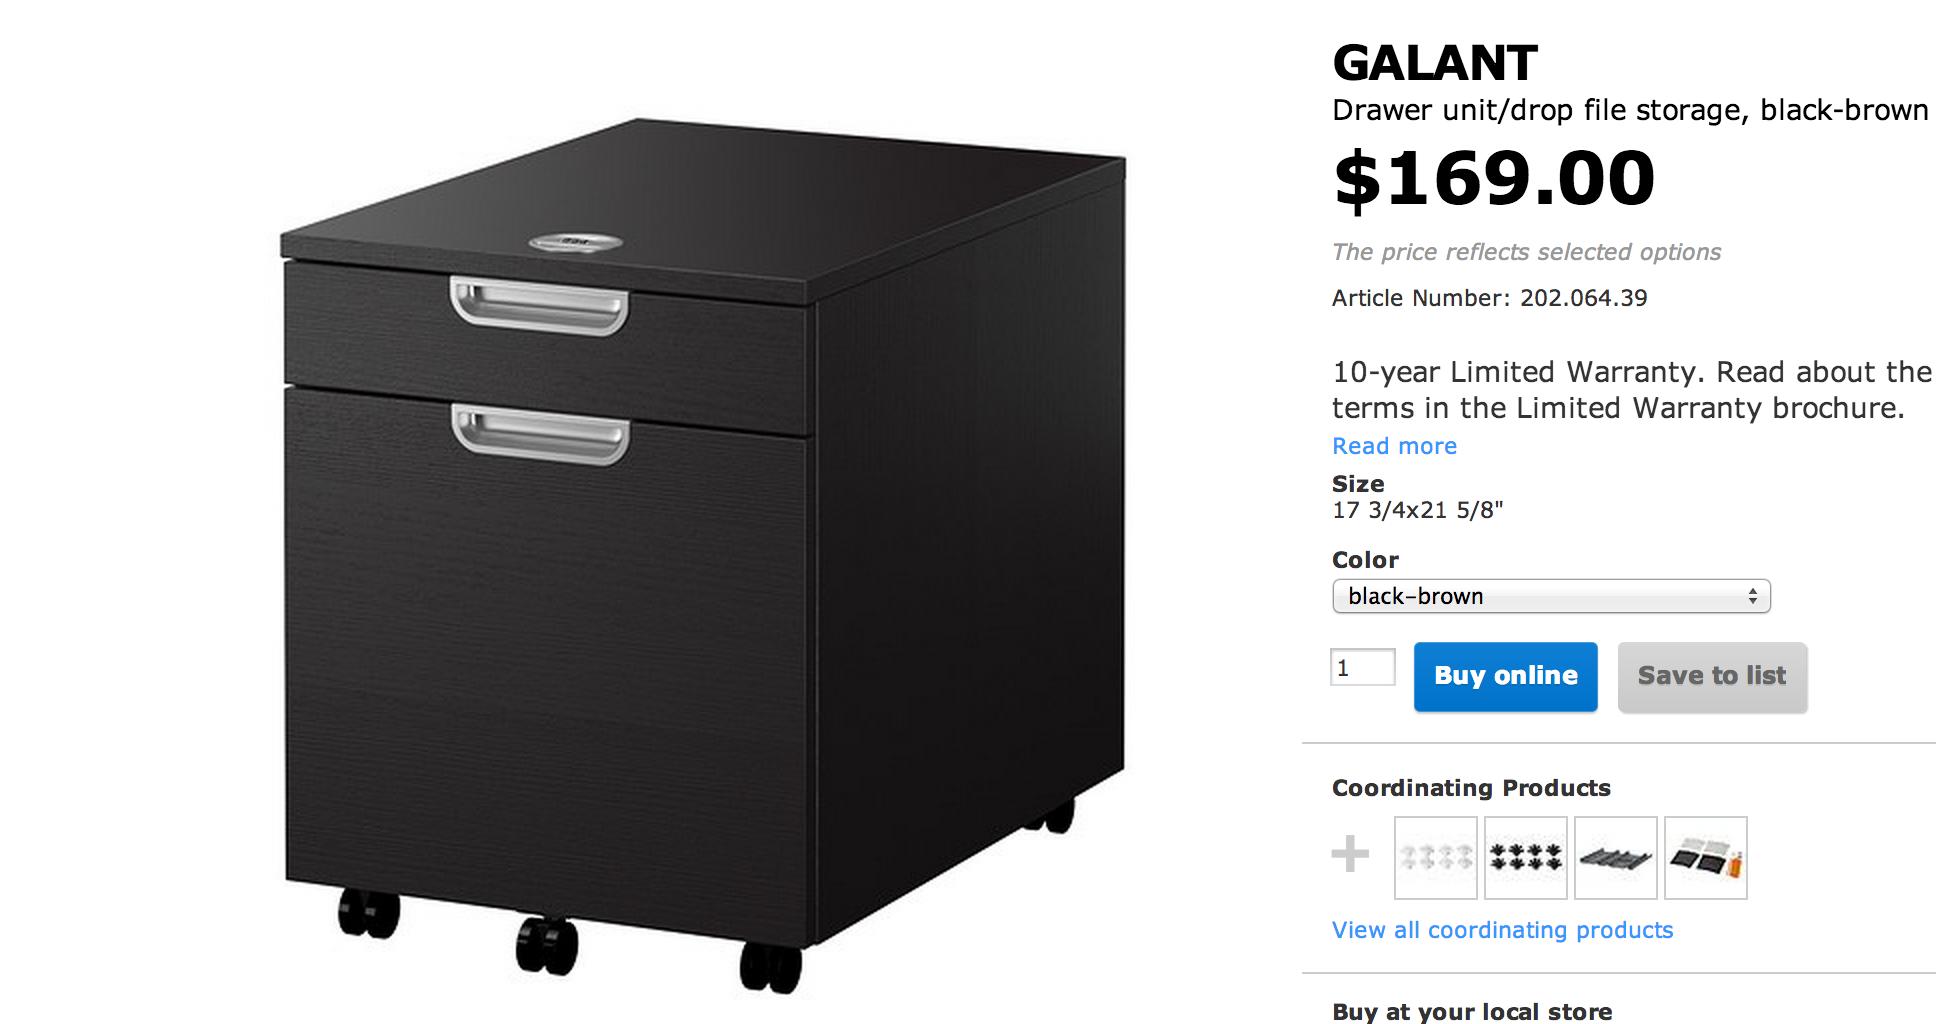 Ikea Galant 2 Drawer File Cabinet Drawer Unit Ikea Galant